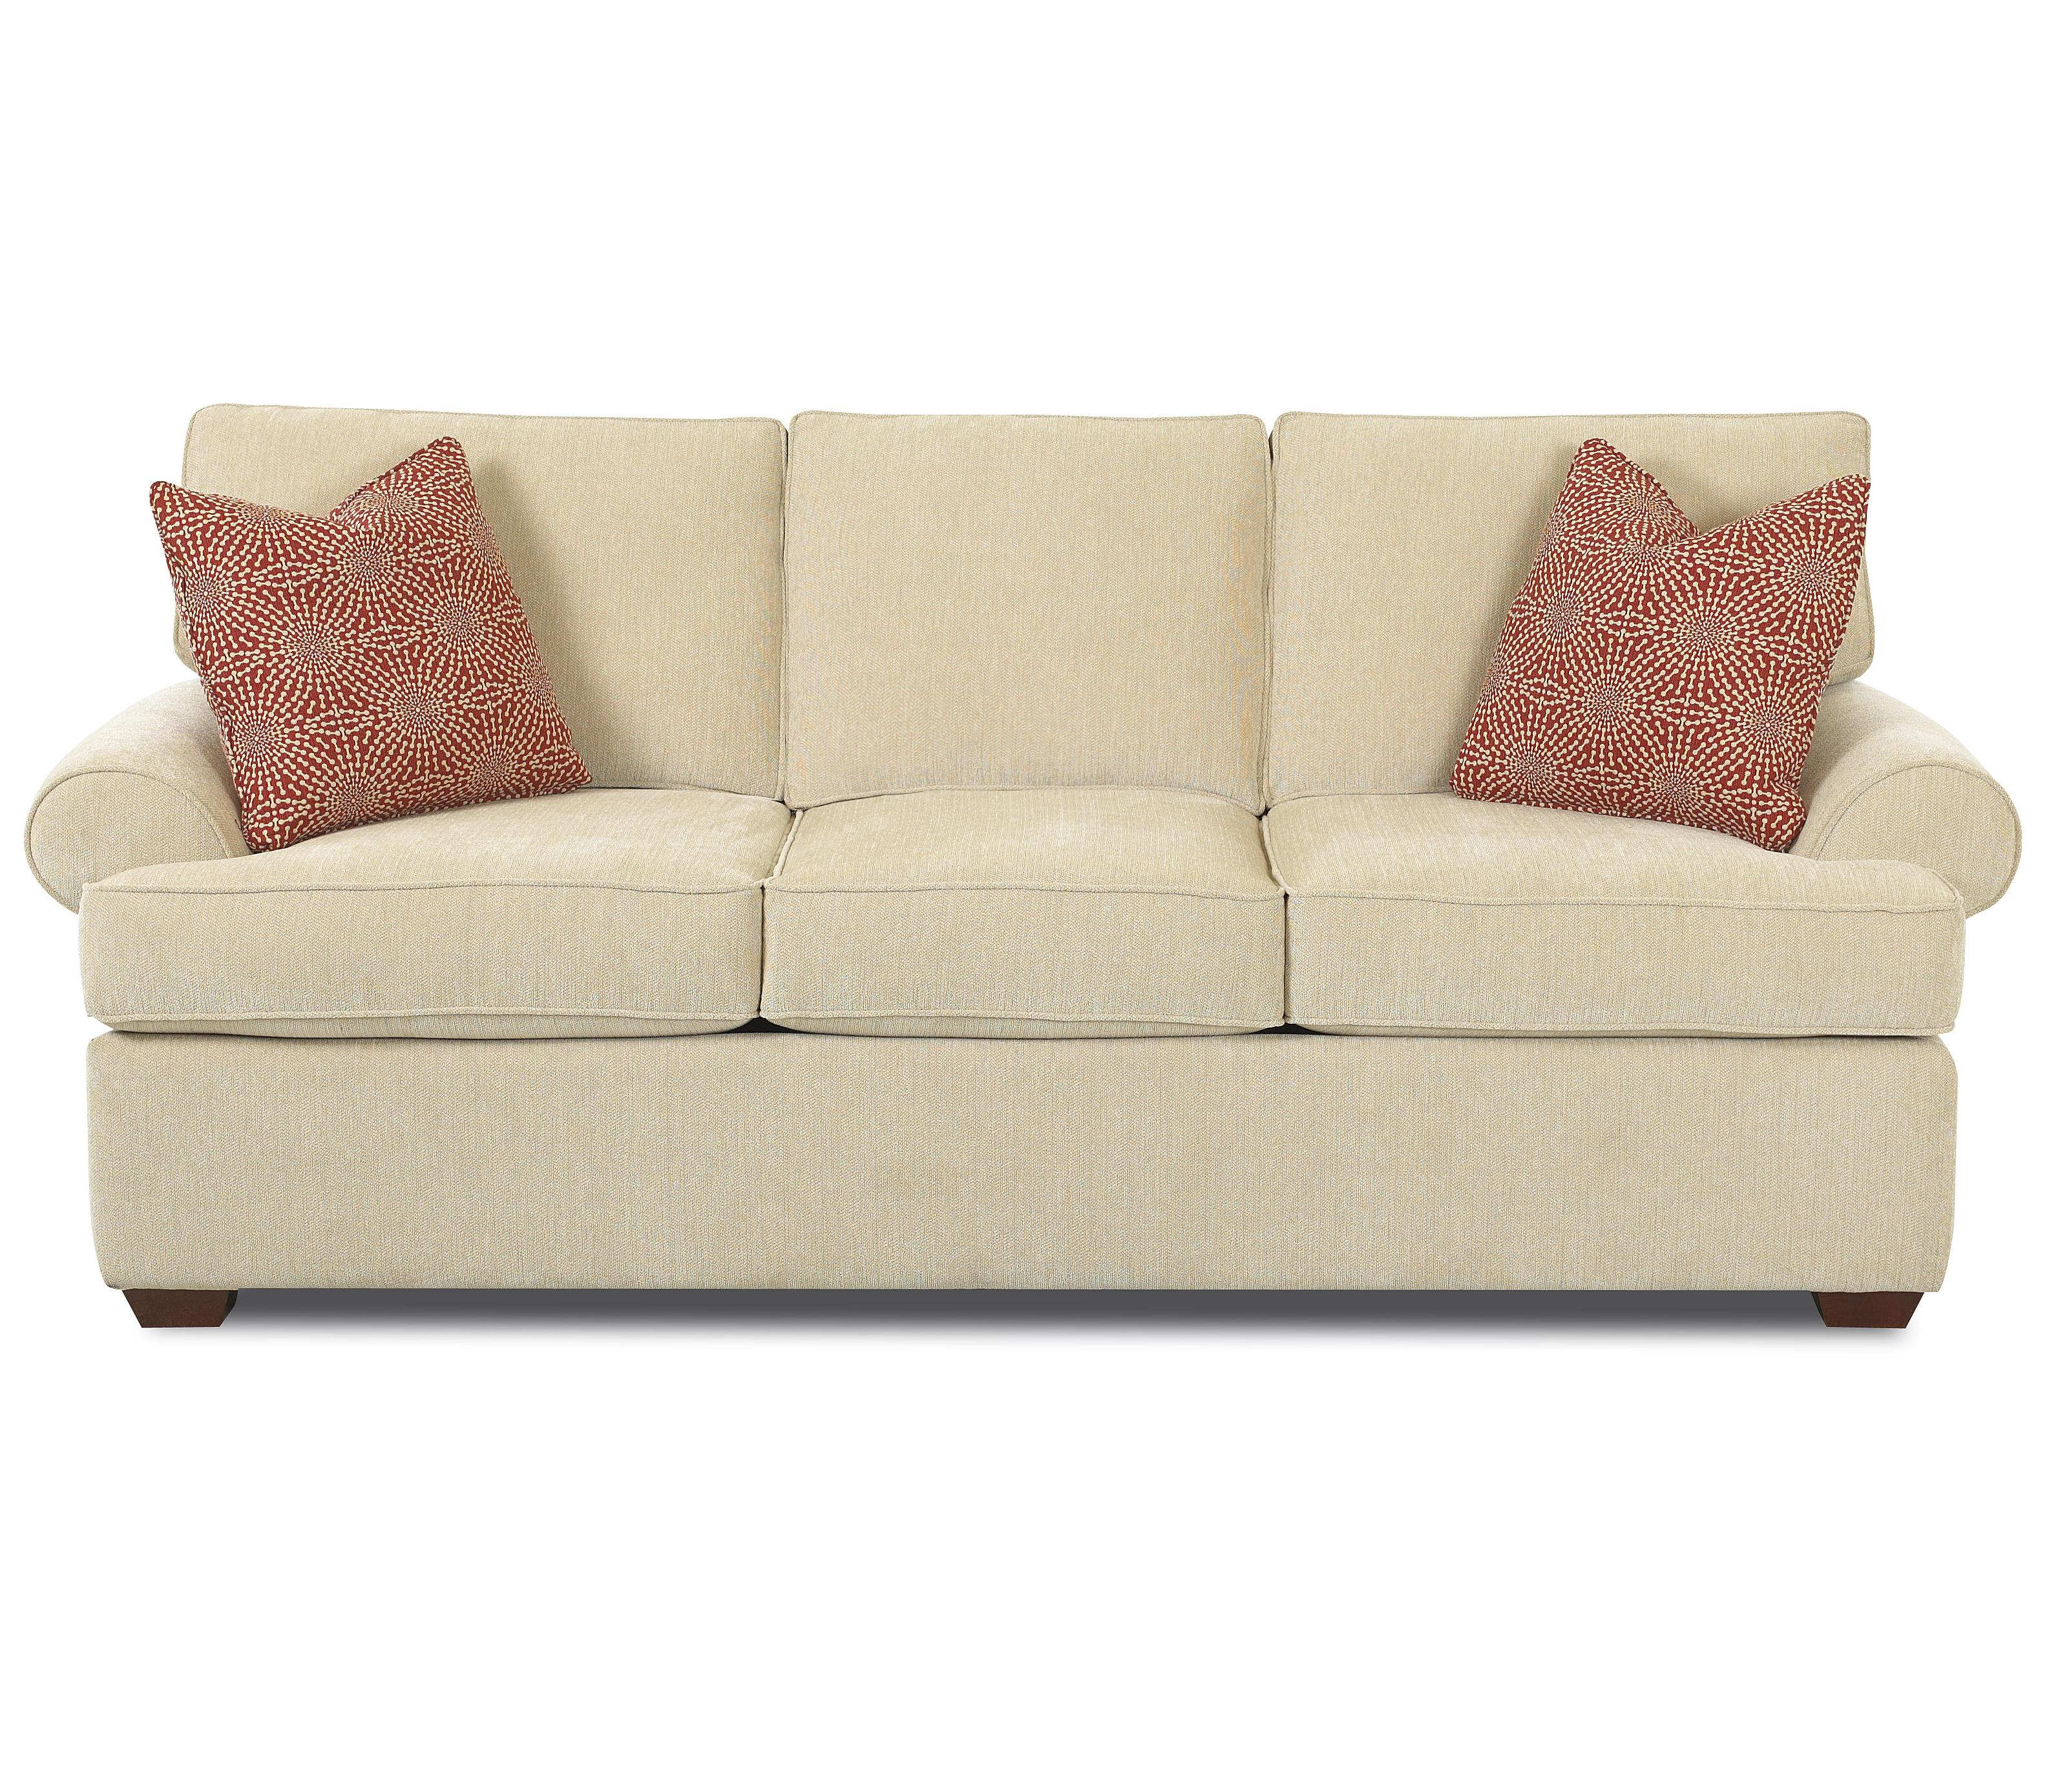 Belfort Basics Choices Custom Upholstery Innerspring Queen Sleeper - Item Number: K51360 IQSL